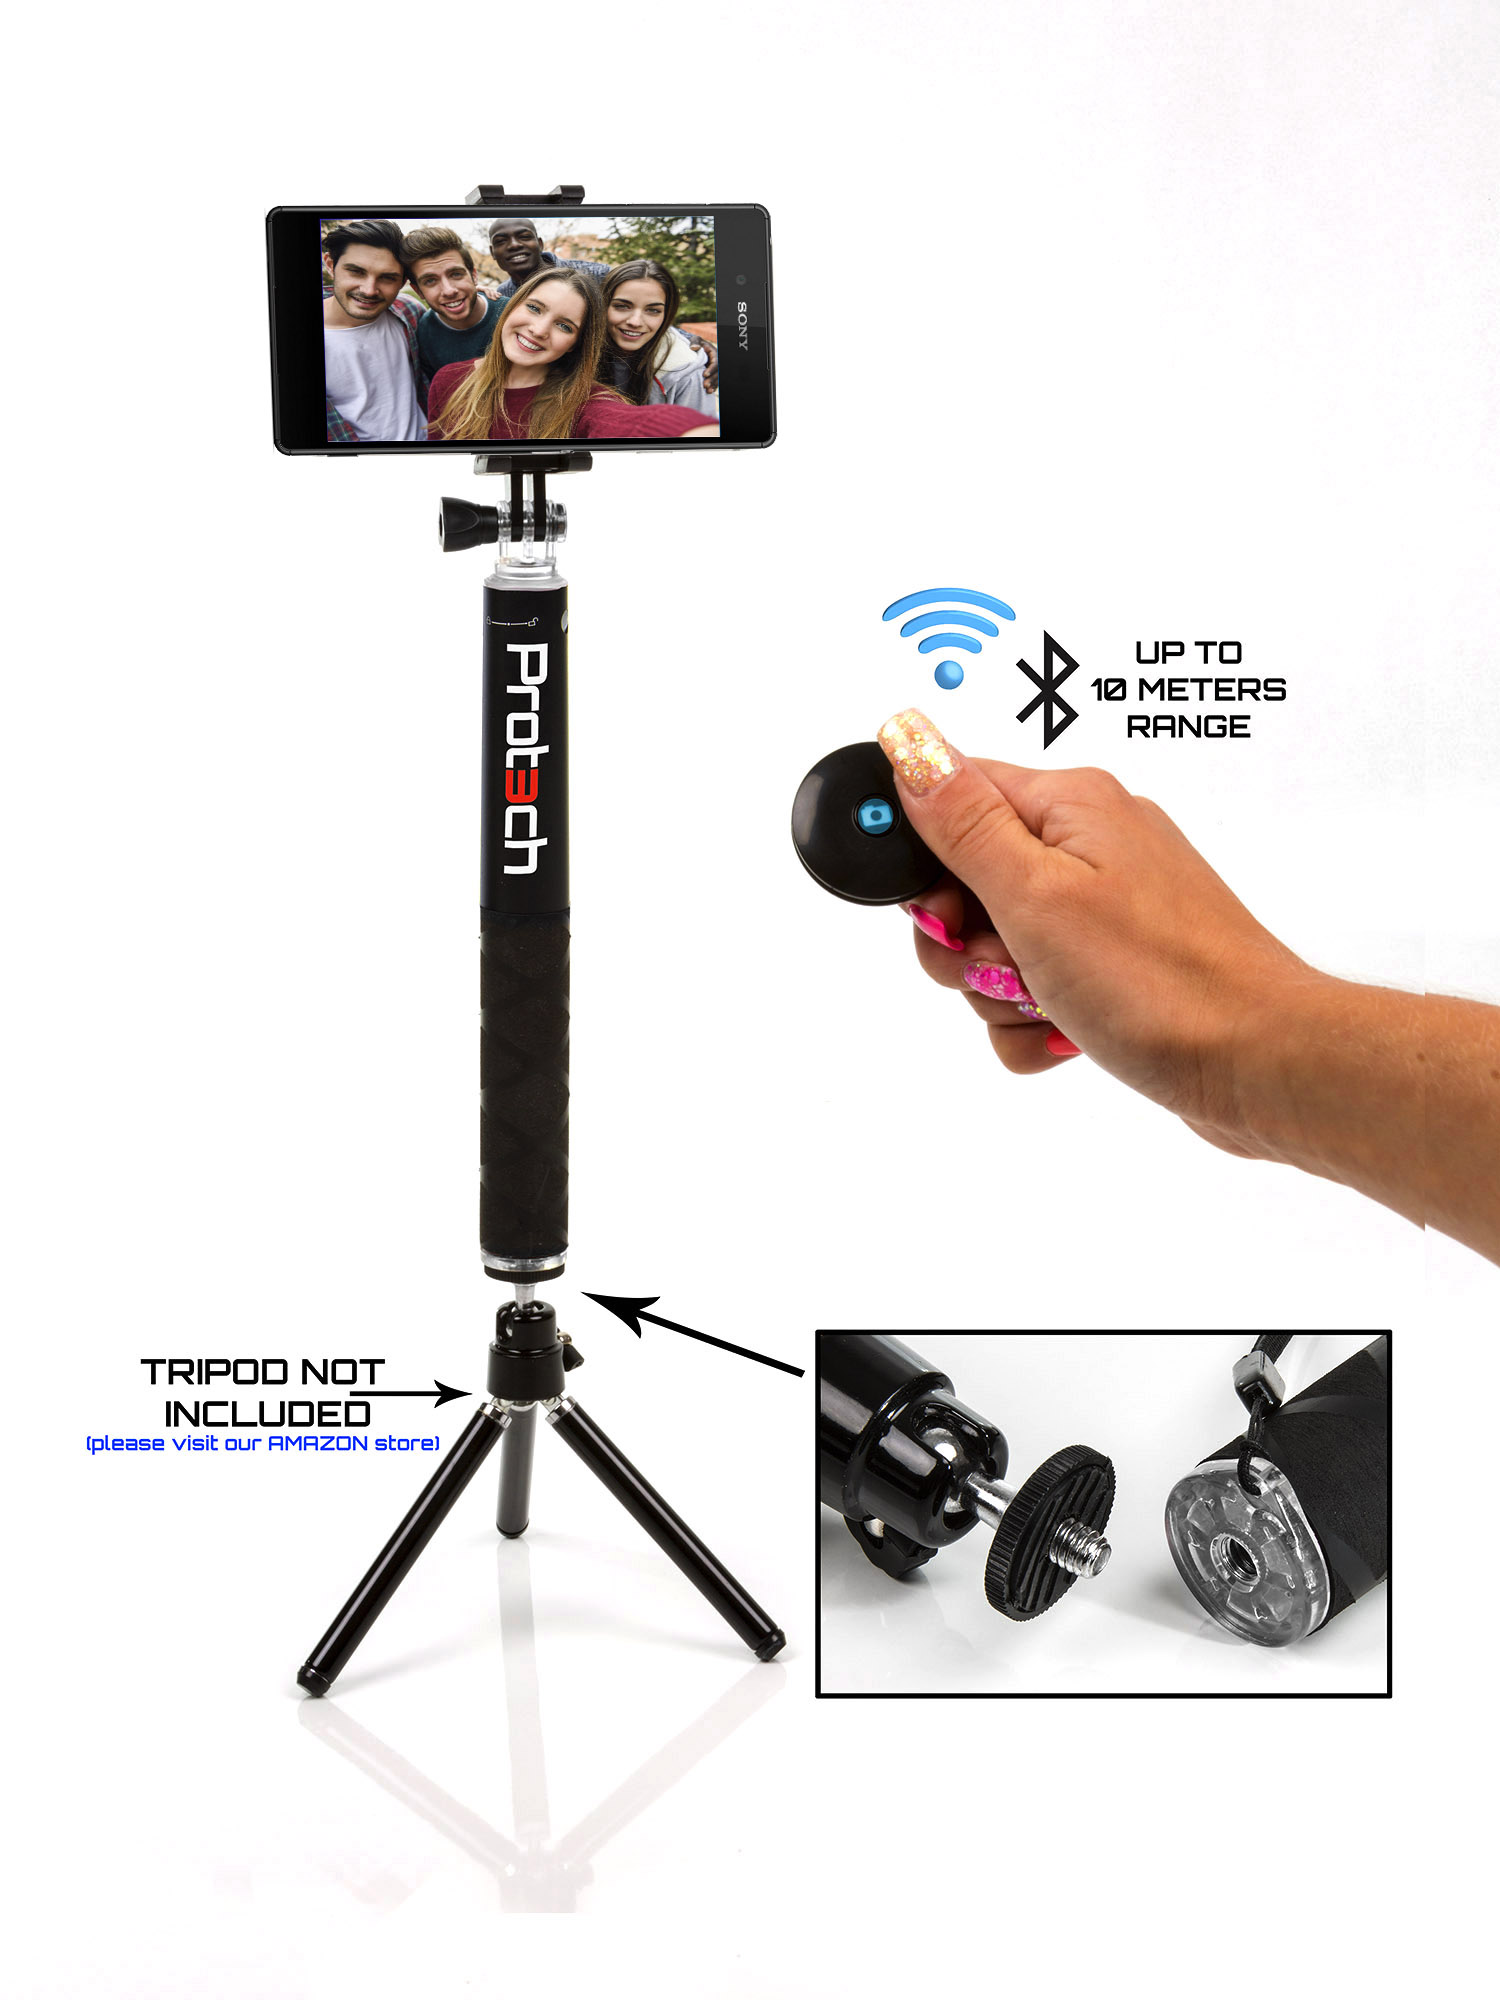 sony xperia monopod selfie stick 60cm telescopic compact bluetooth tripod ebay. Black Bedroom Furniture Sets. Home Design Ideas